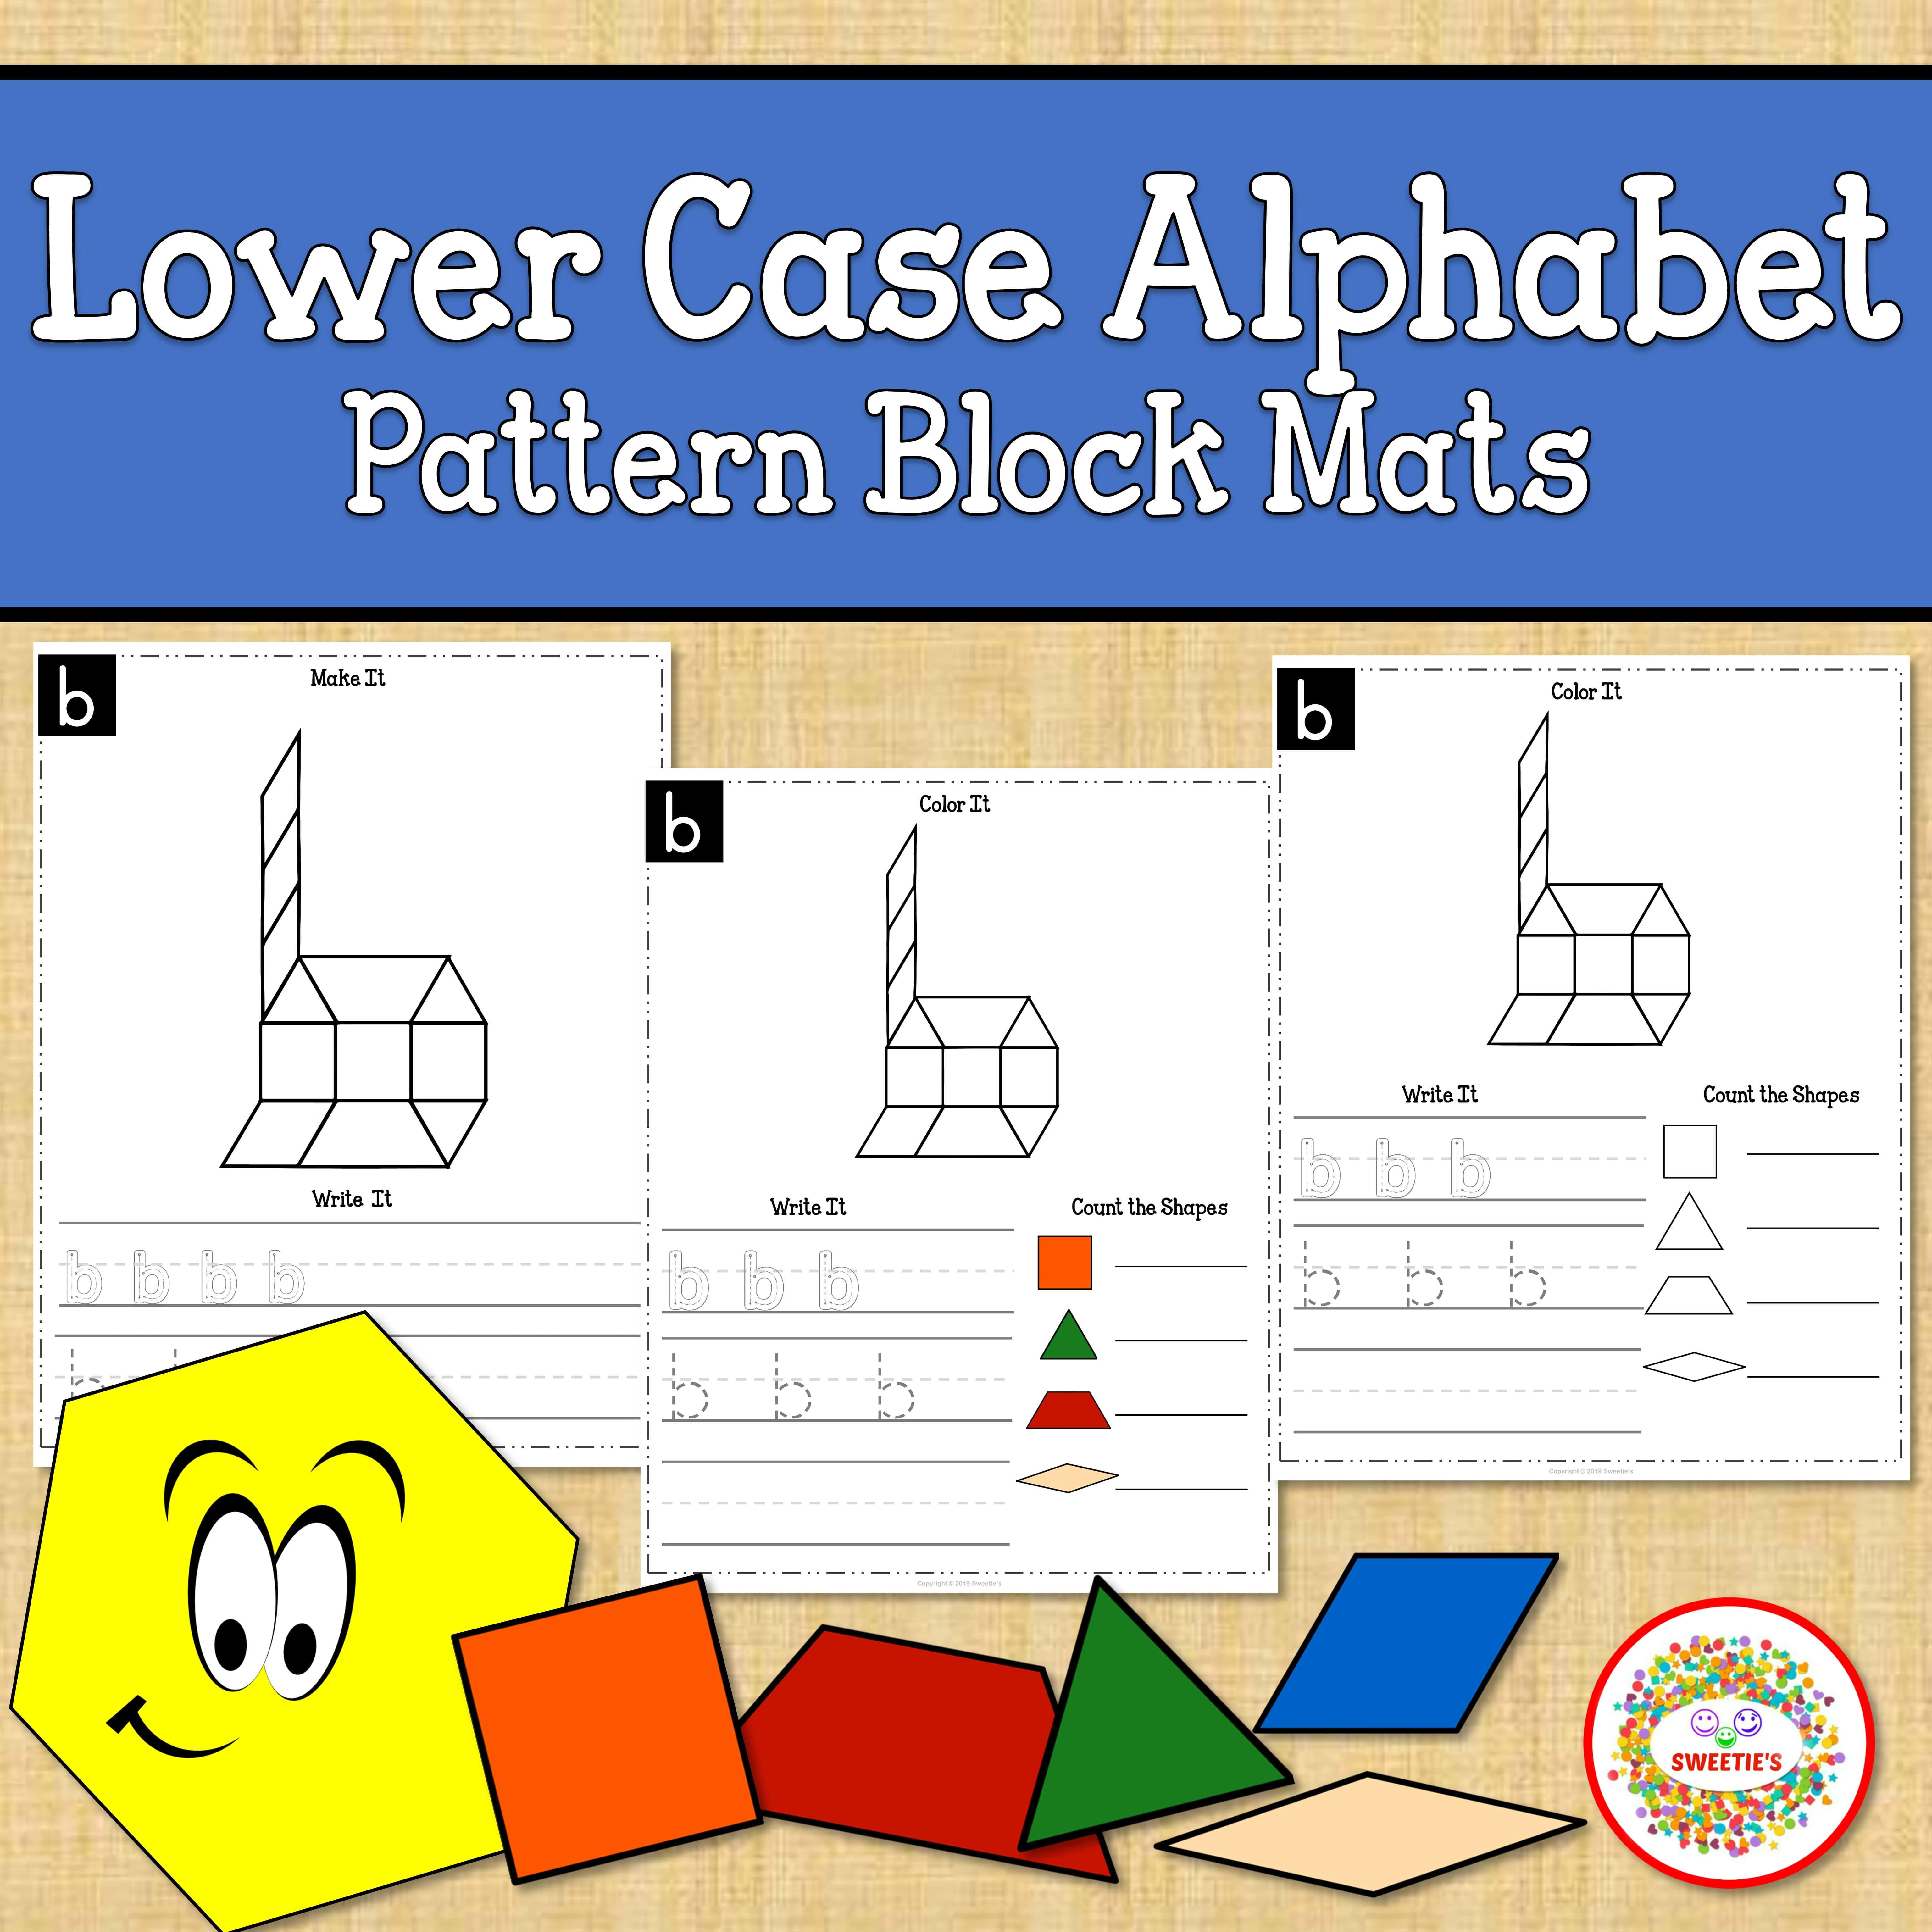 Alphabet Pattern Blocks Mats Lower Case